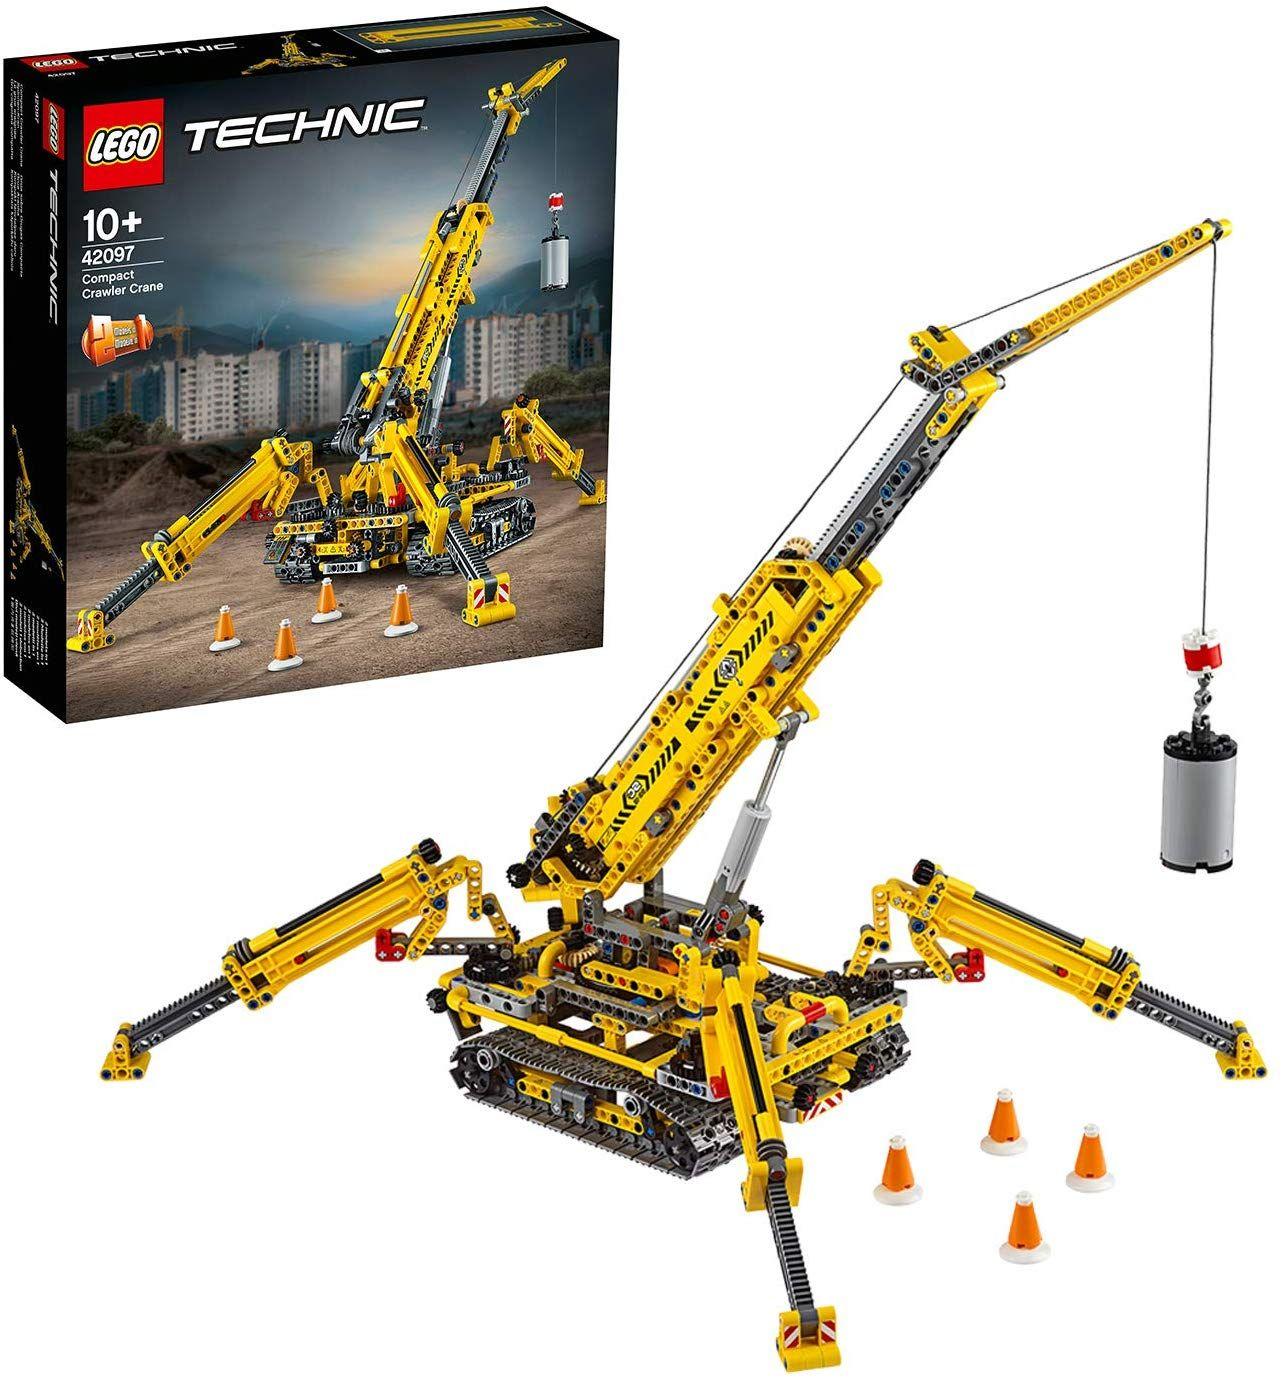 LEGO 42097 Technic Compact Crawler Crane and Tower Crane, 2 in 1 Spiderlike Model £64.99 @ Amazon